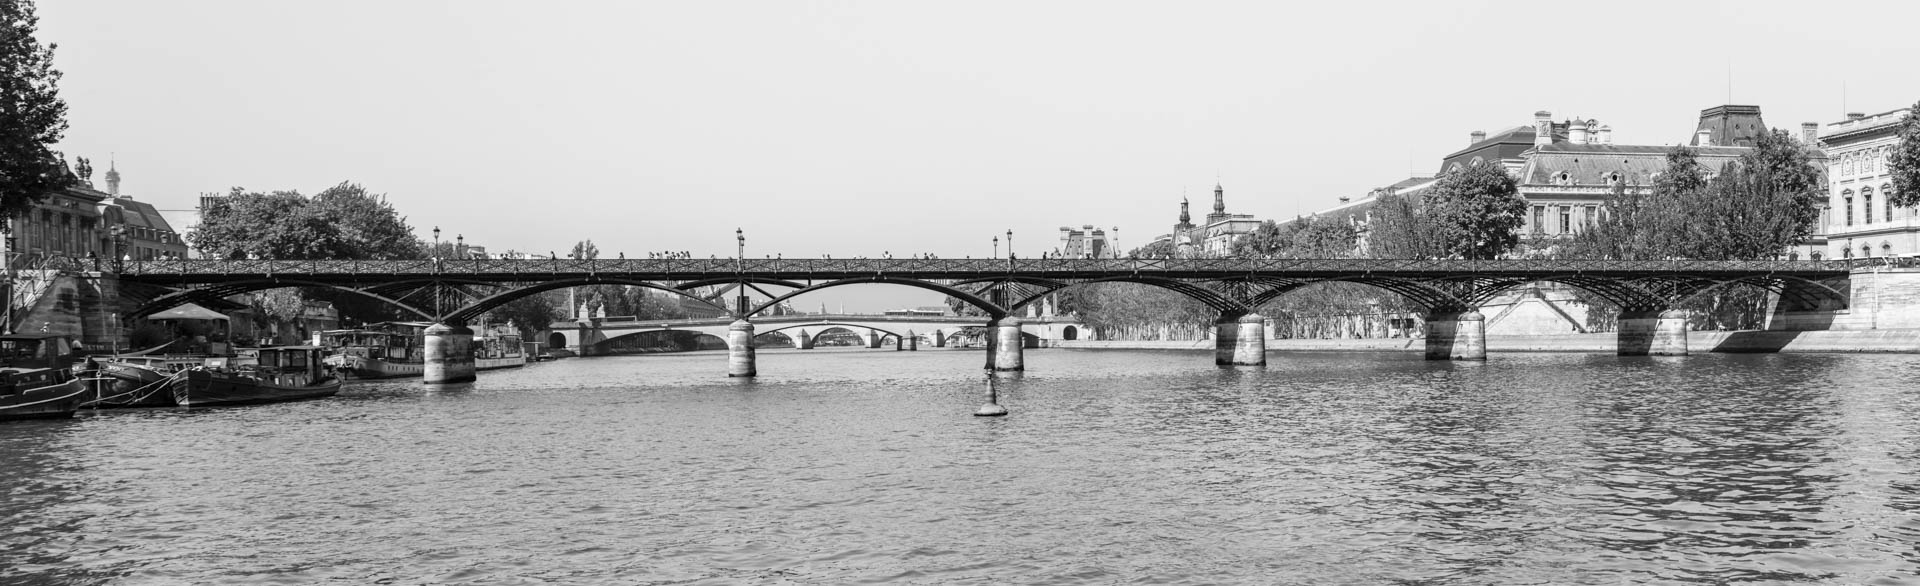 PARIS 2019-N&B_01.jpg